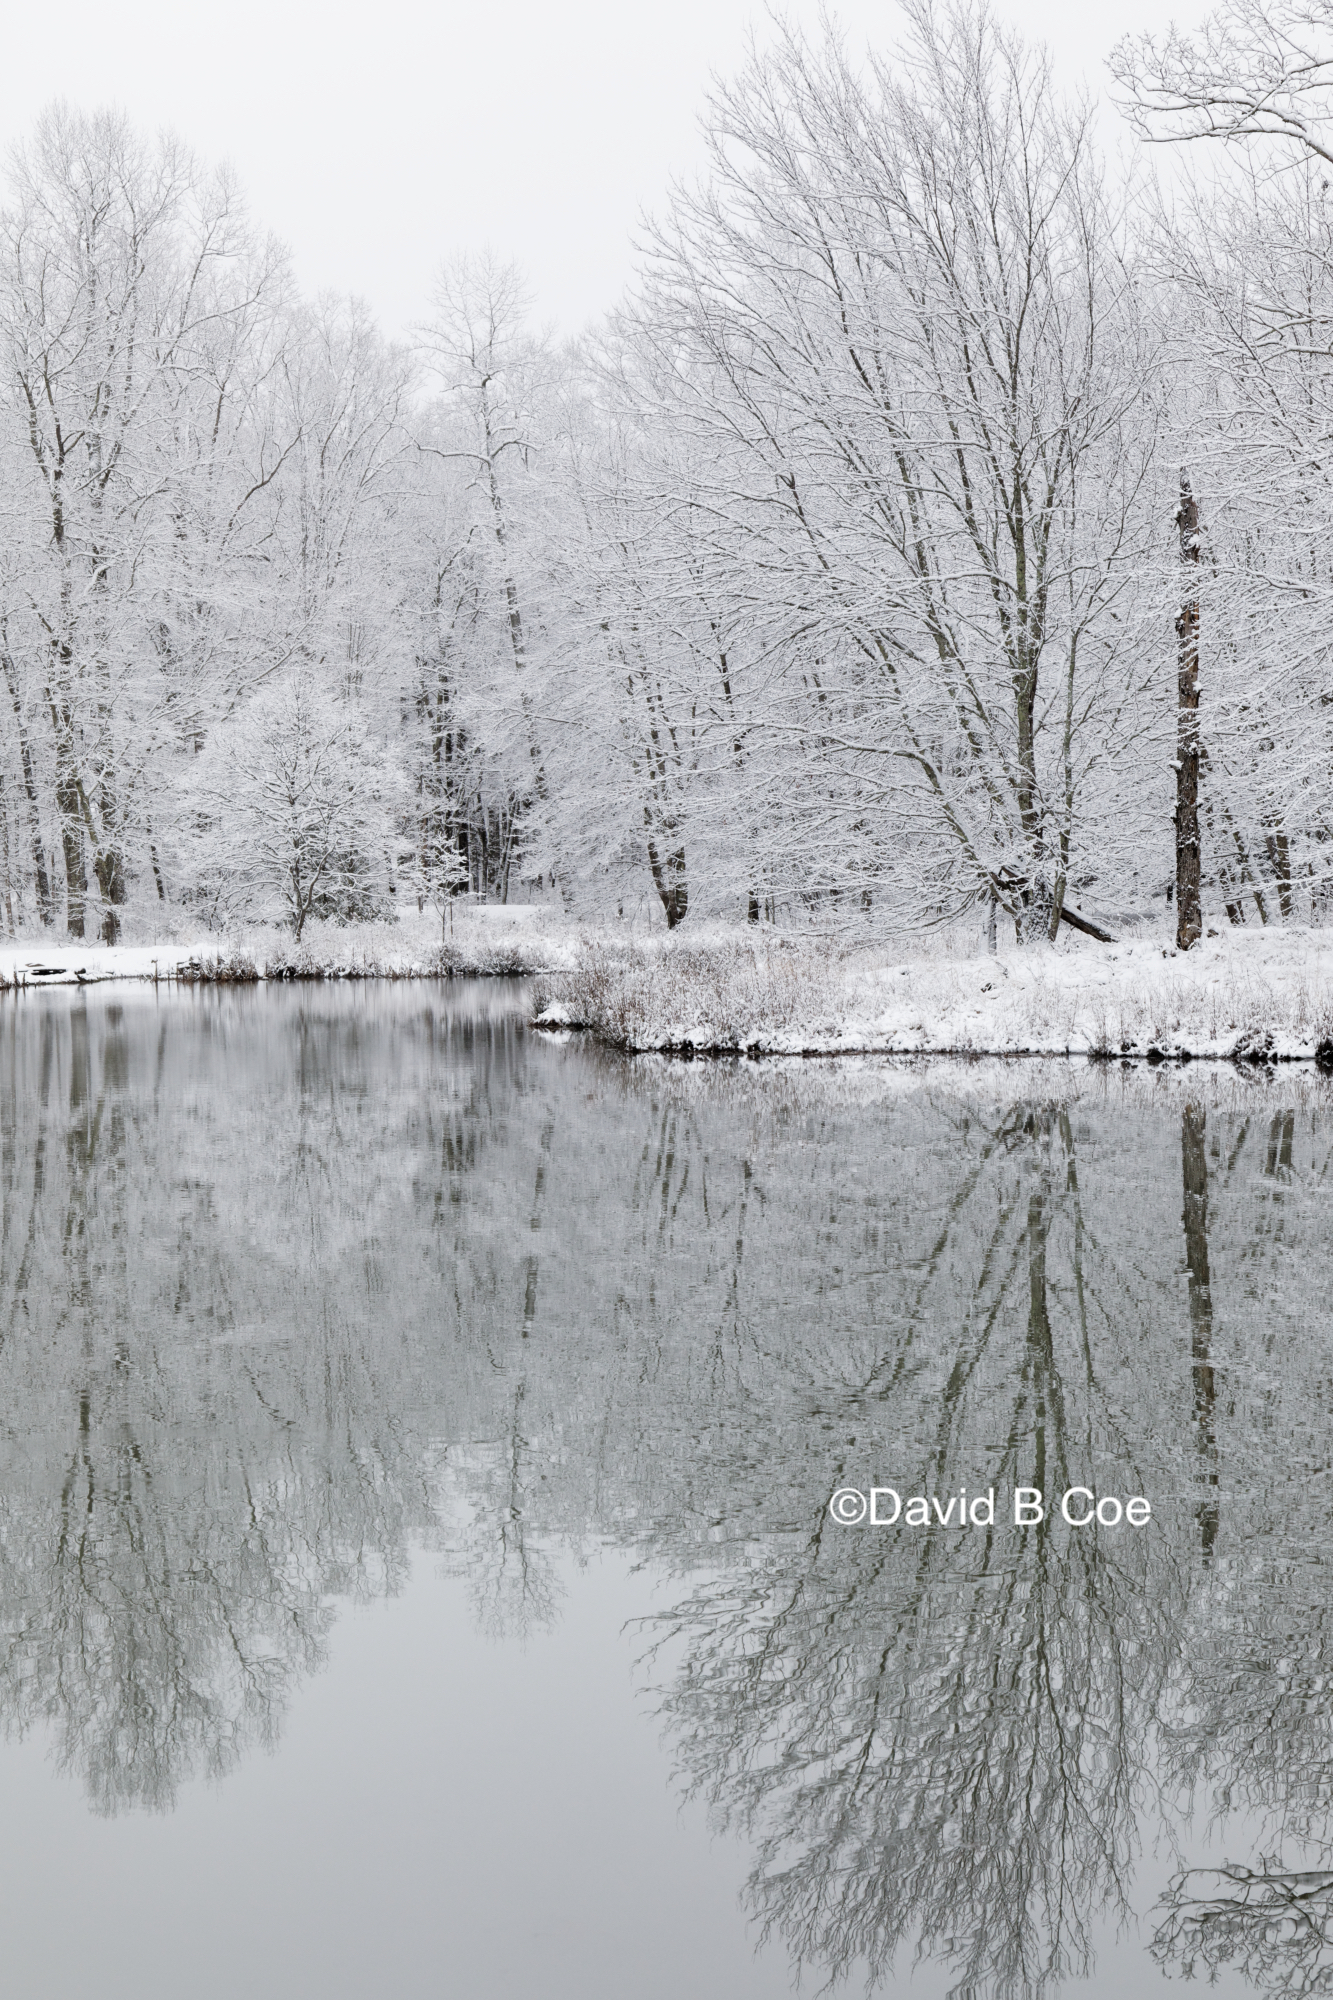 Pond in Snow II, by David B. Coe